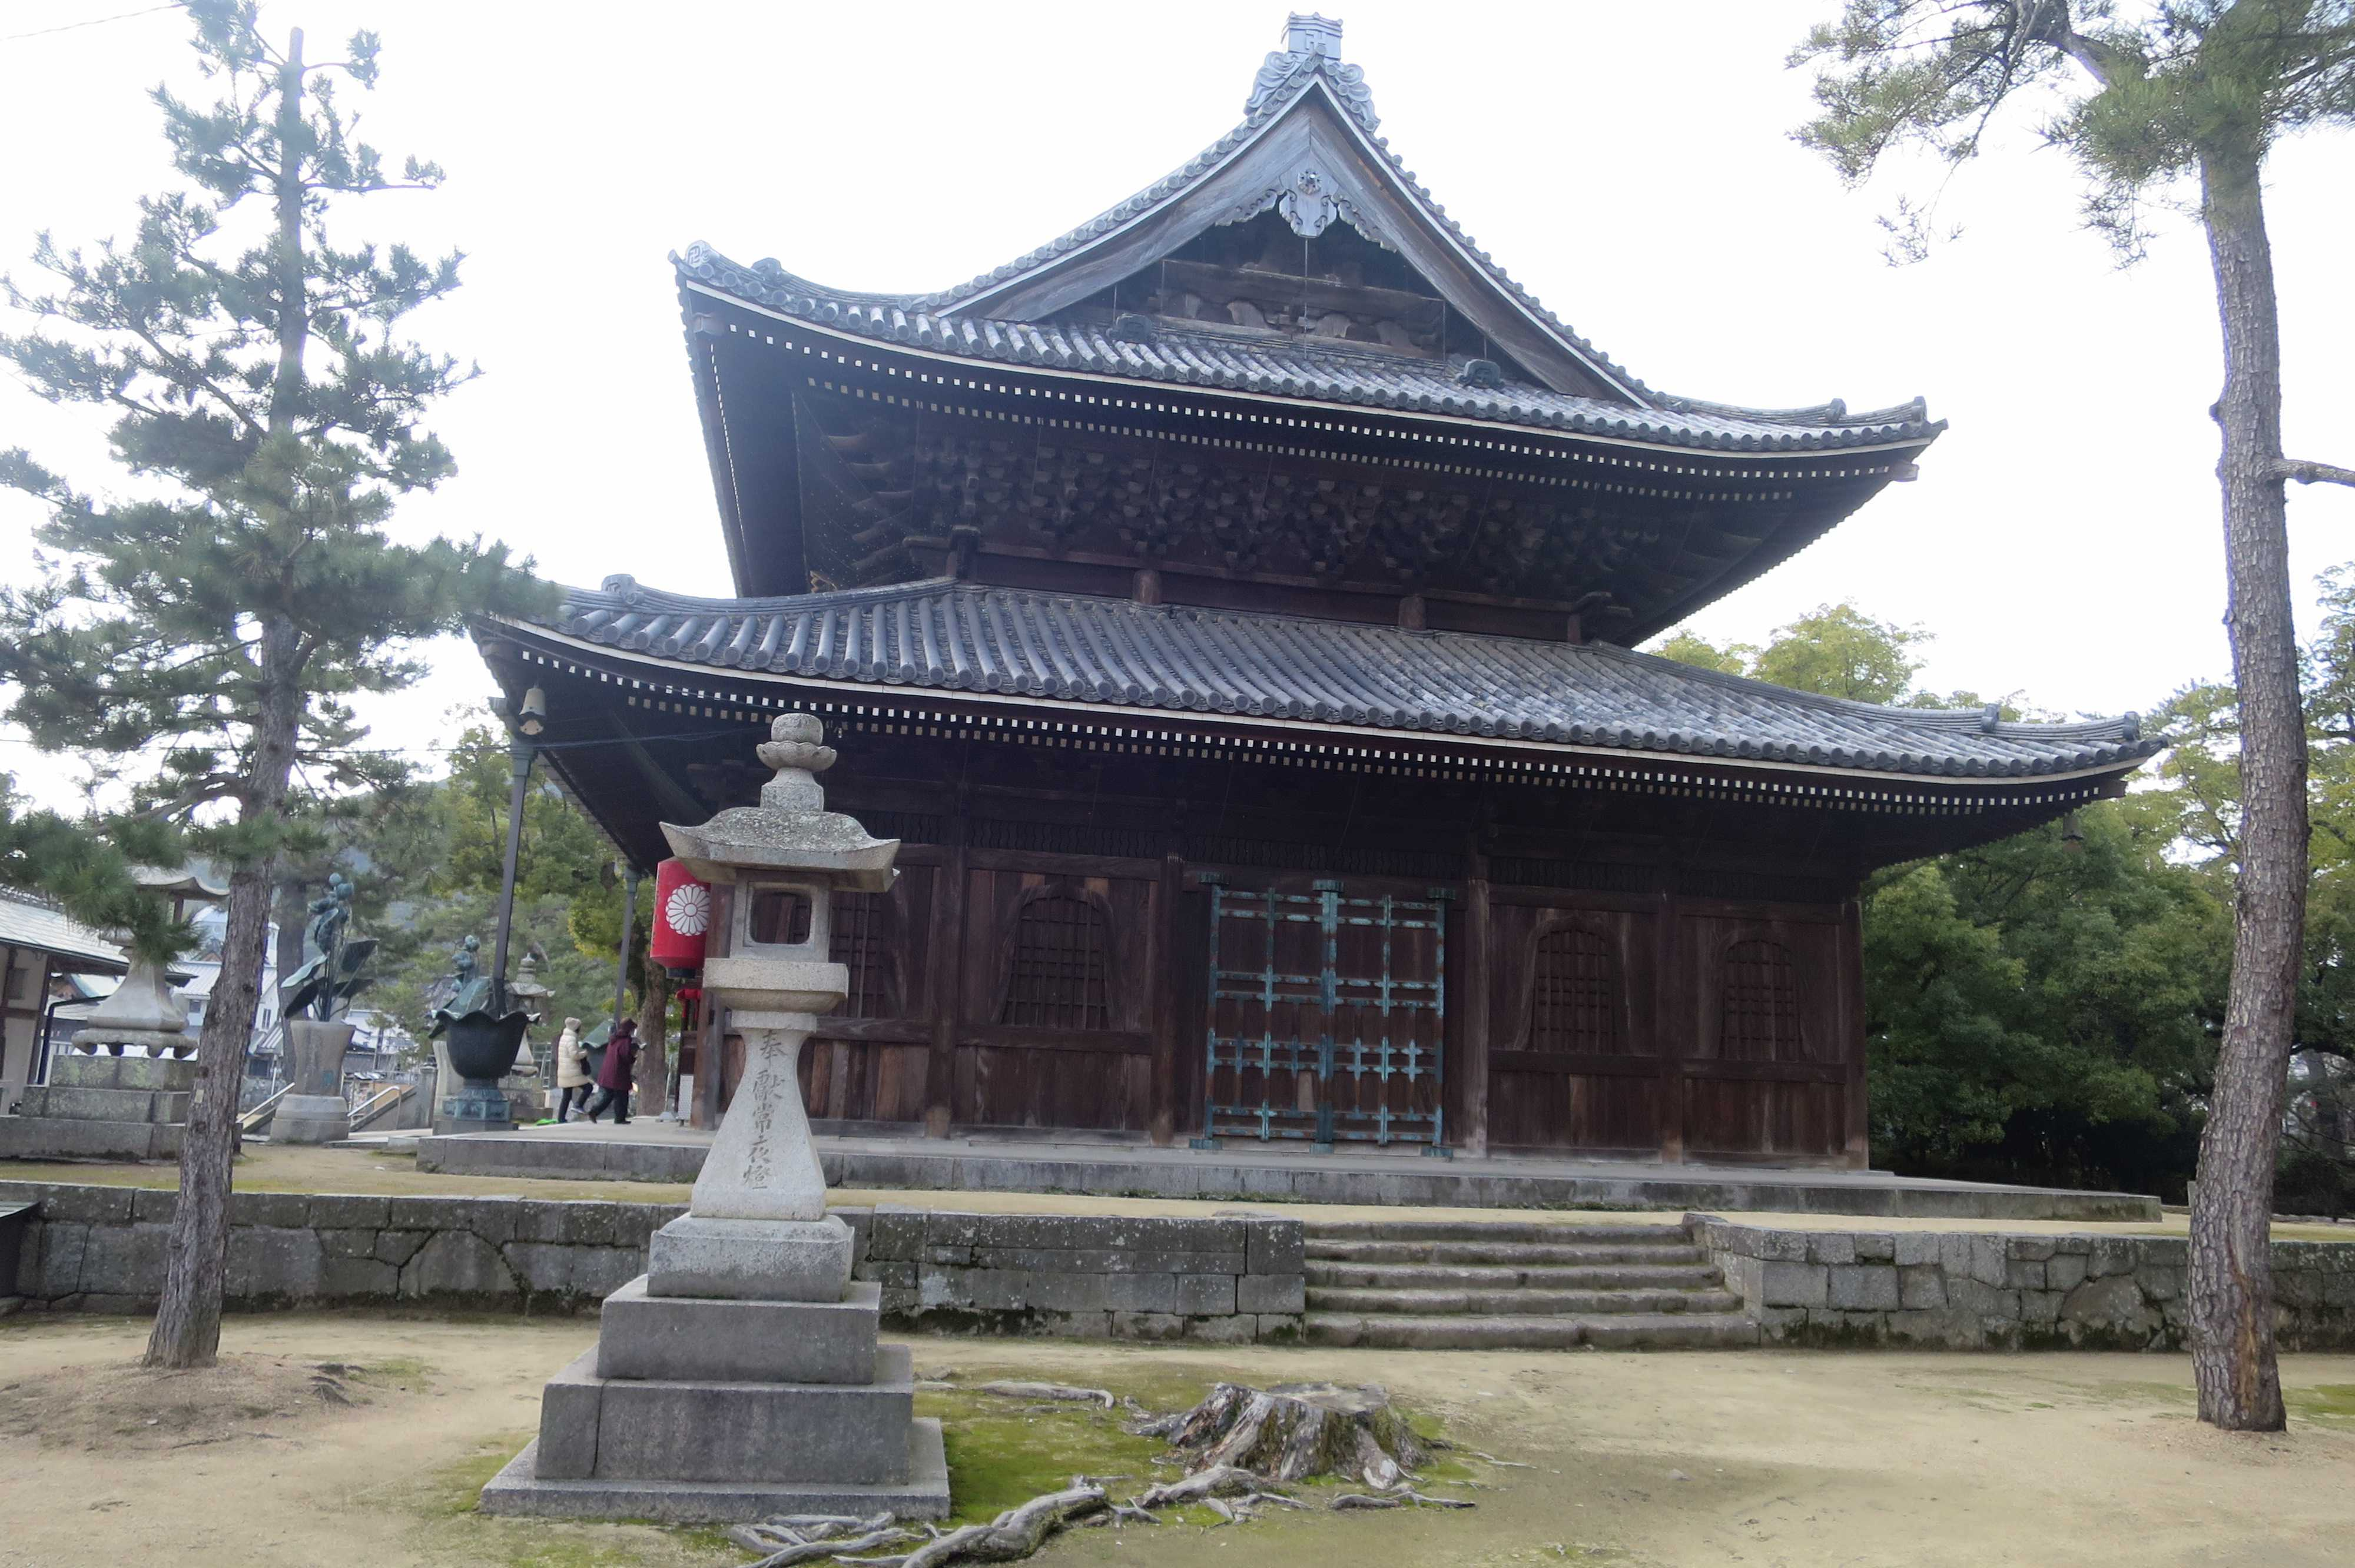 善通寺 - 東院の金堂